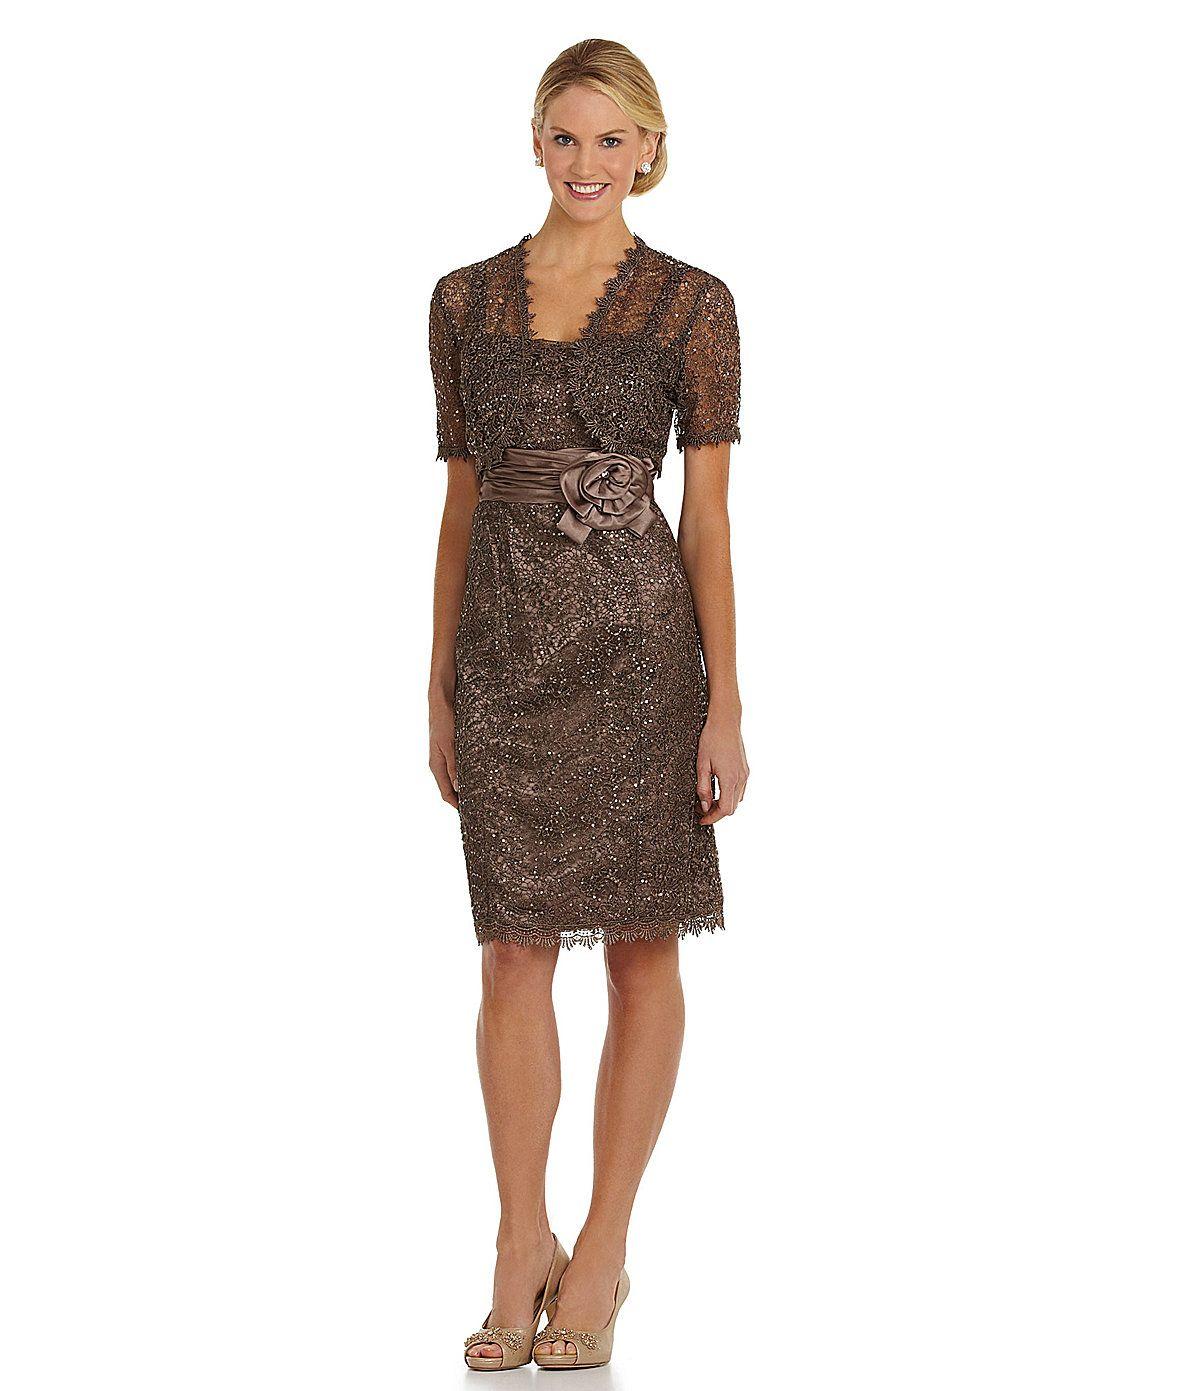 Dillards Wedding Gifts: R & M Richards Sequined Metallic Lace Jacket Dress